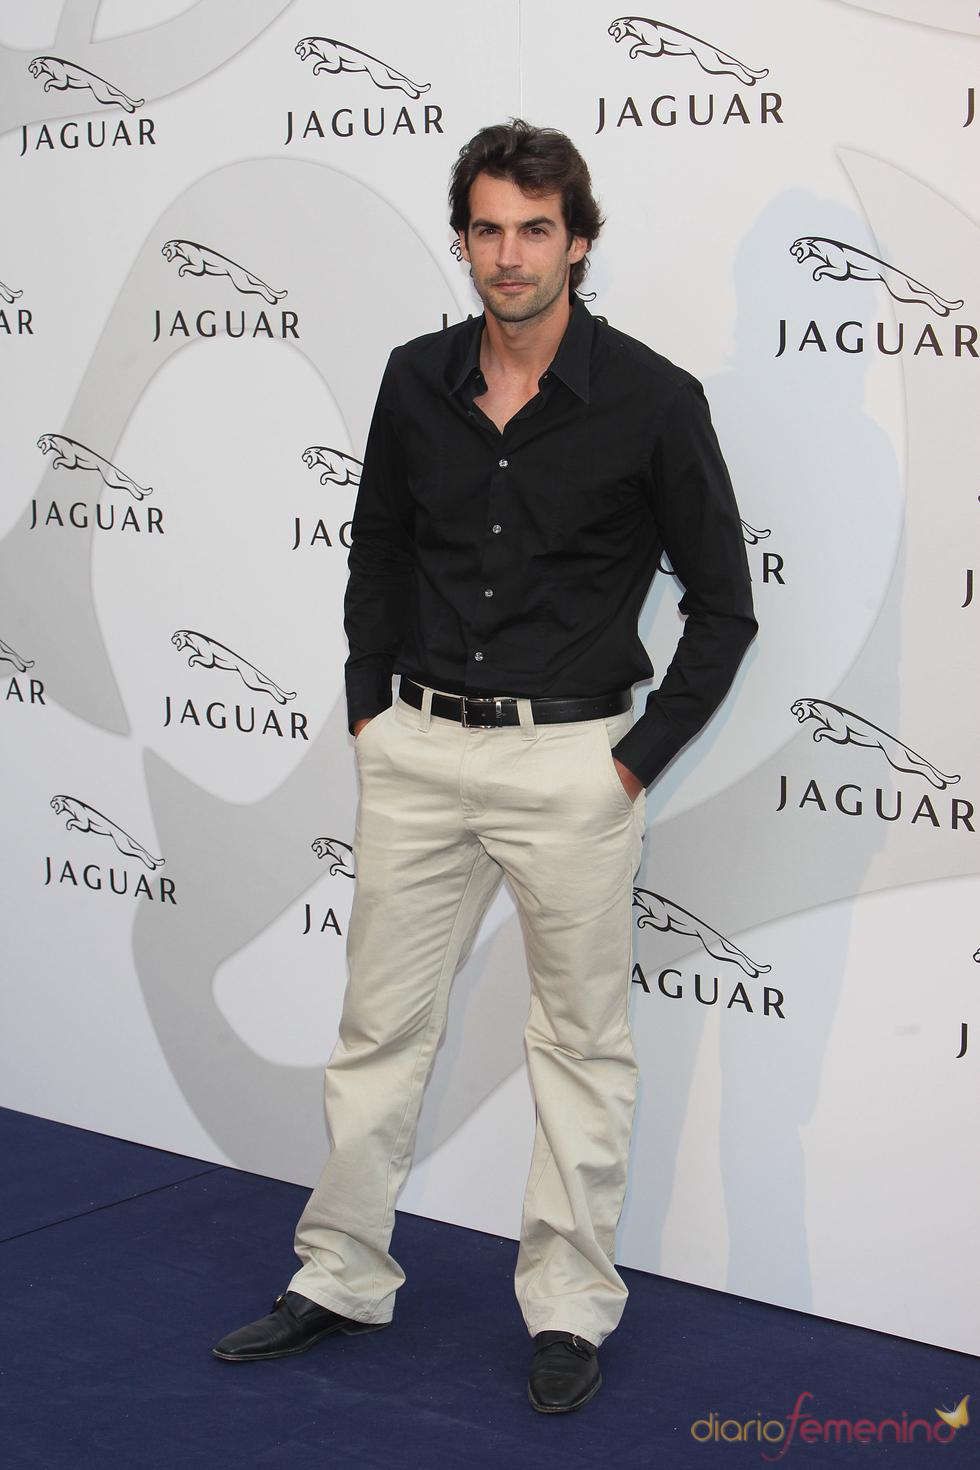 Álex Adrover en un acto promocional de la firma Jaguar